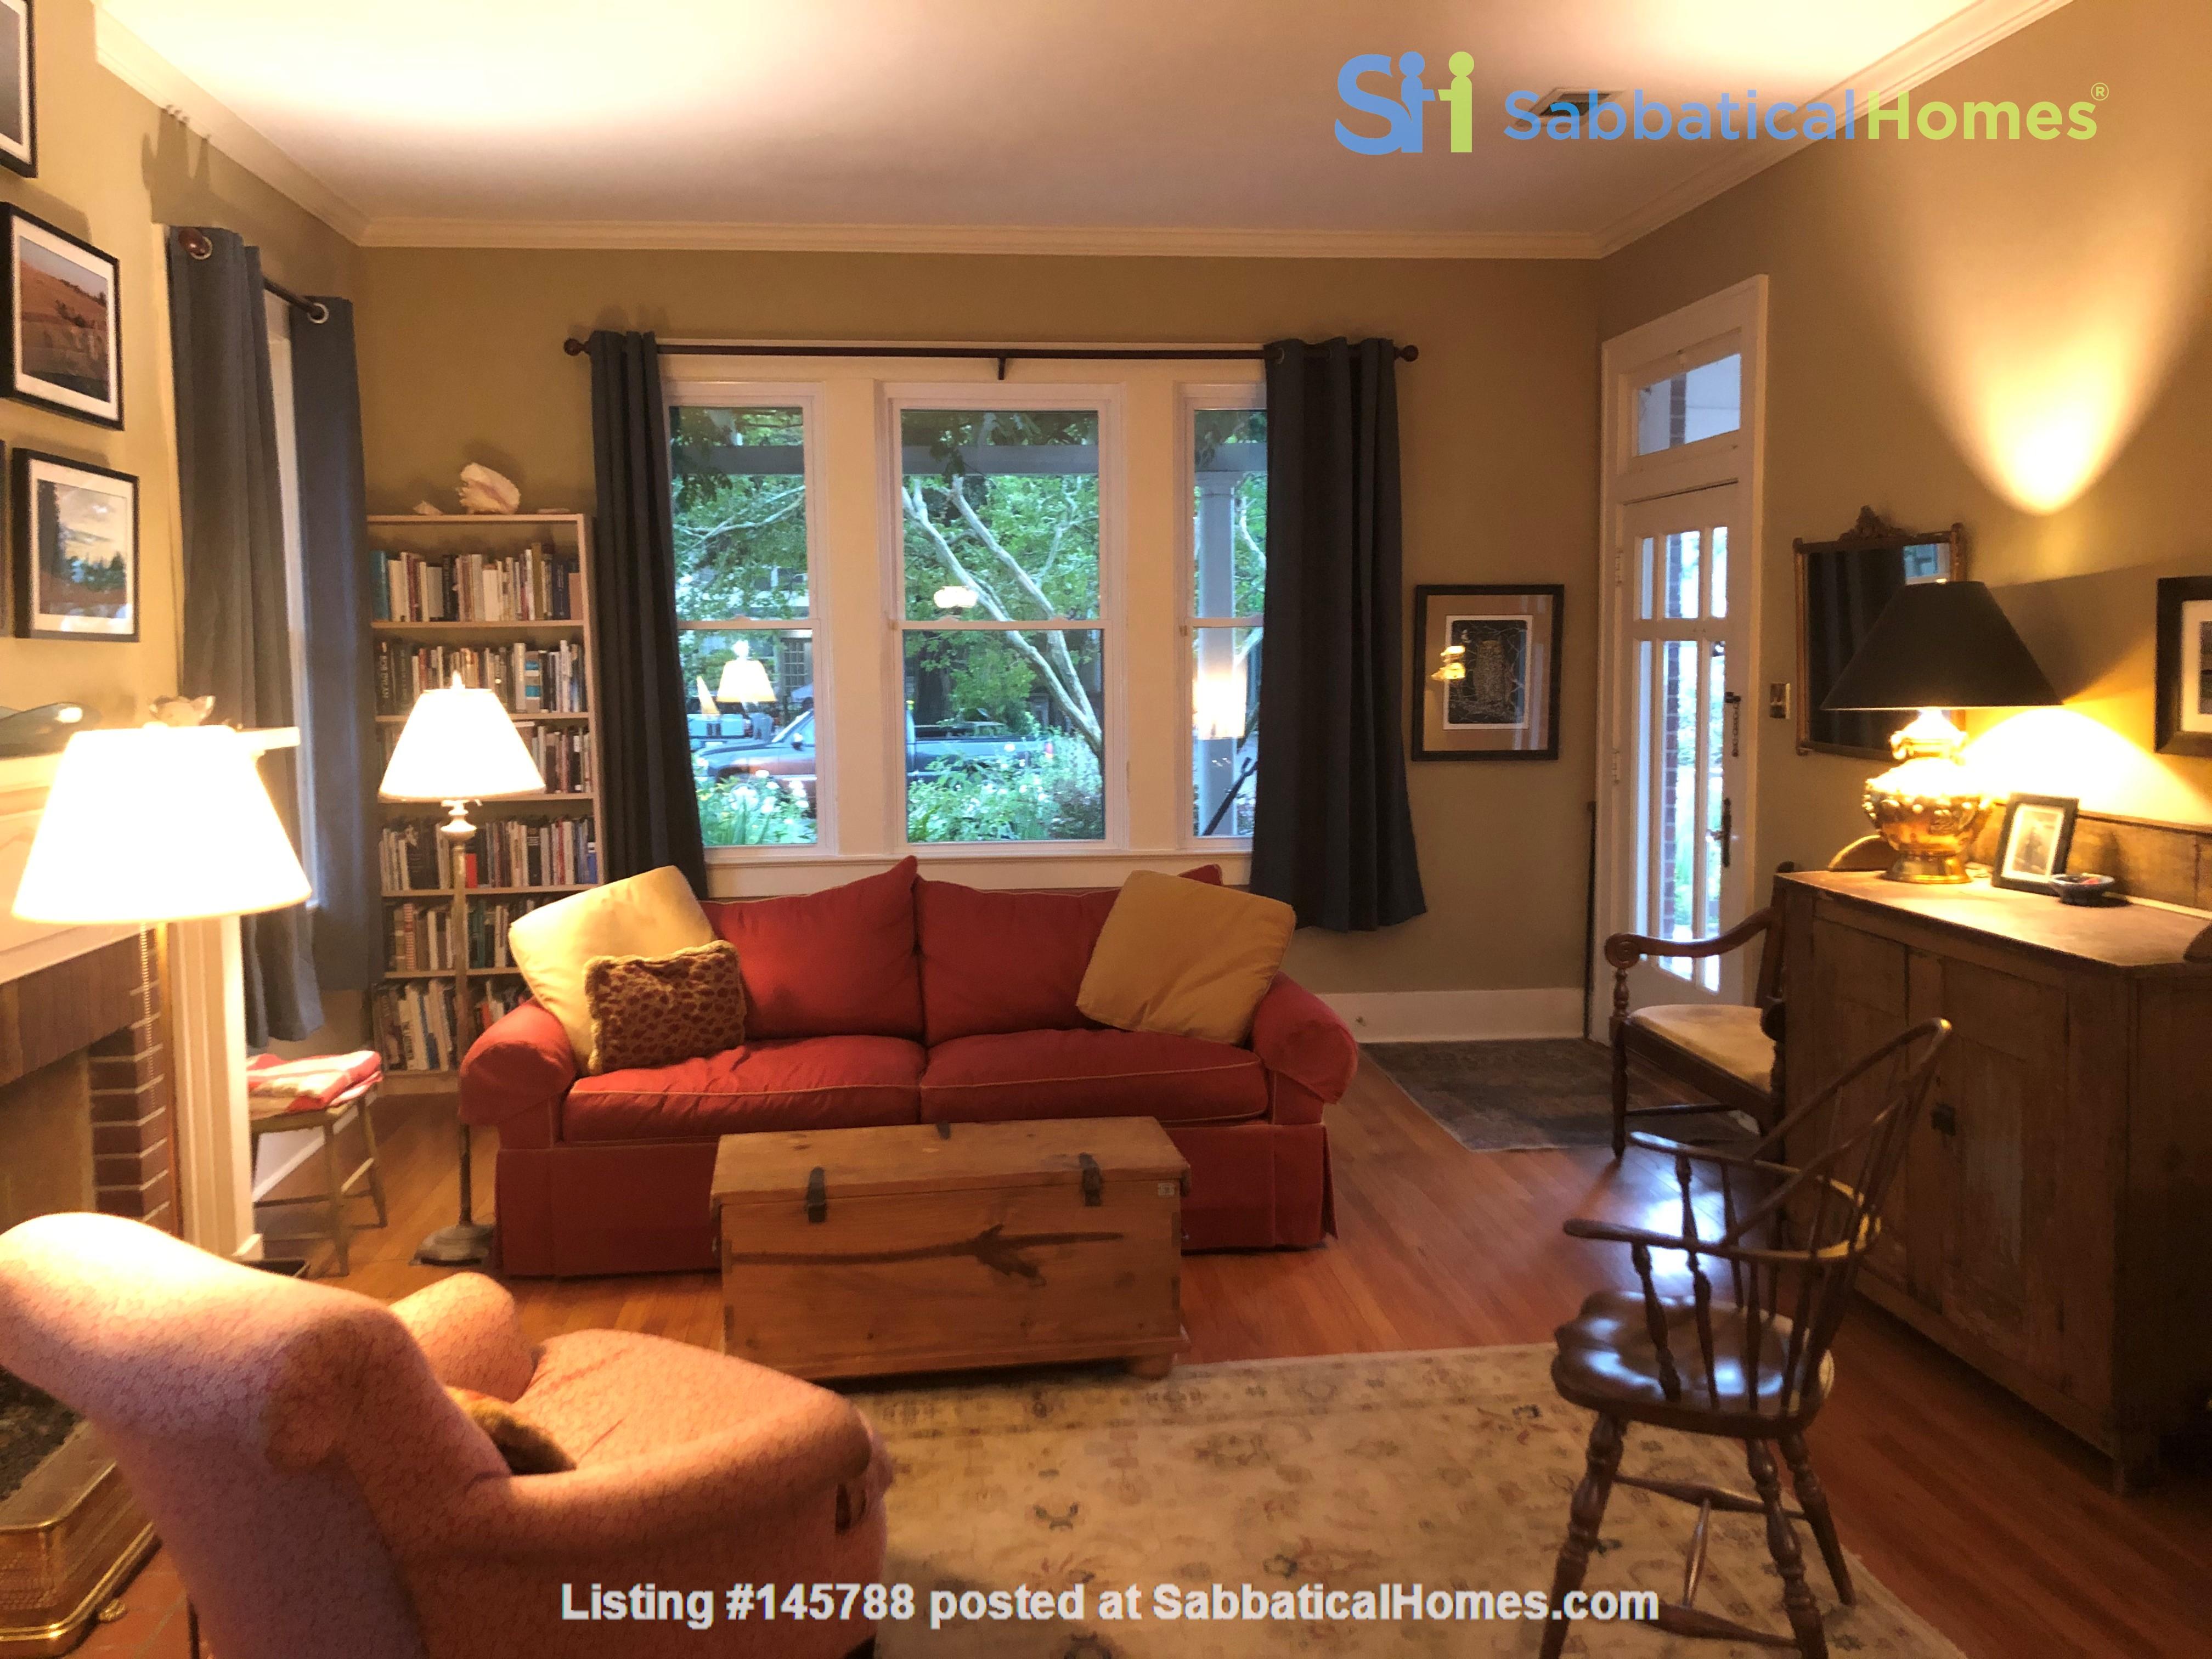 Charming 3 bedroom bungalow in Baton Rouge, Louisiana near LSU Home Rental in Baton Rouge 2